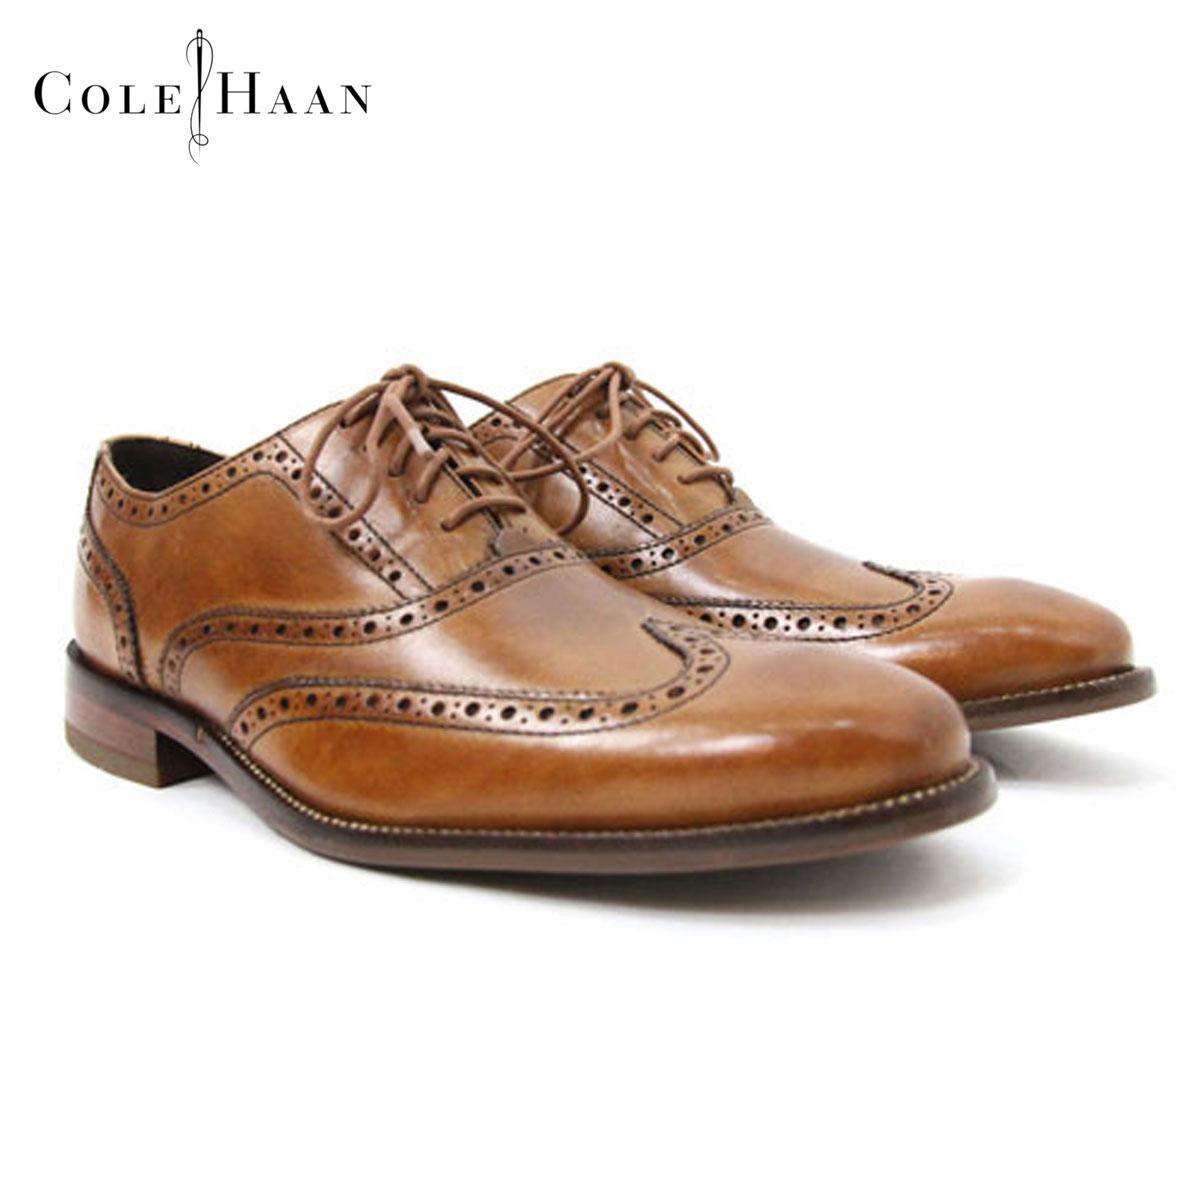 6403cedc910 Rakuten Ichiba shop MIXON  Cole Haan COLE HAAN regular article dress shoes  WILLIAMS.WNG.II C12210 (BRITISH TAN) 10P31Aug14